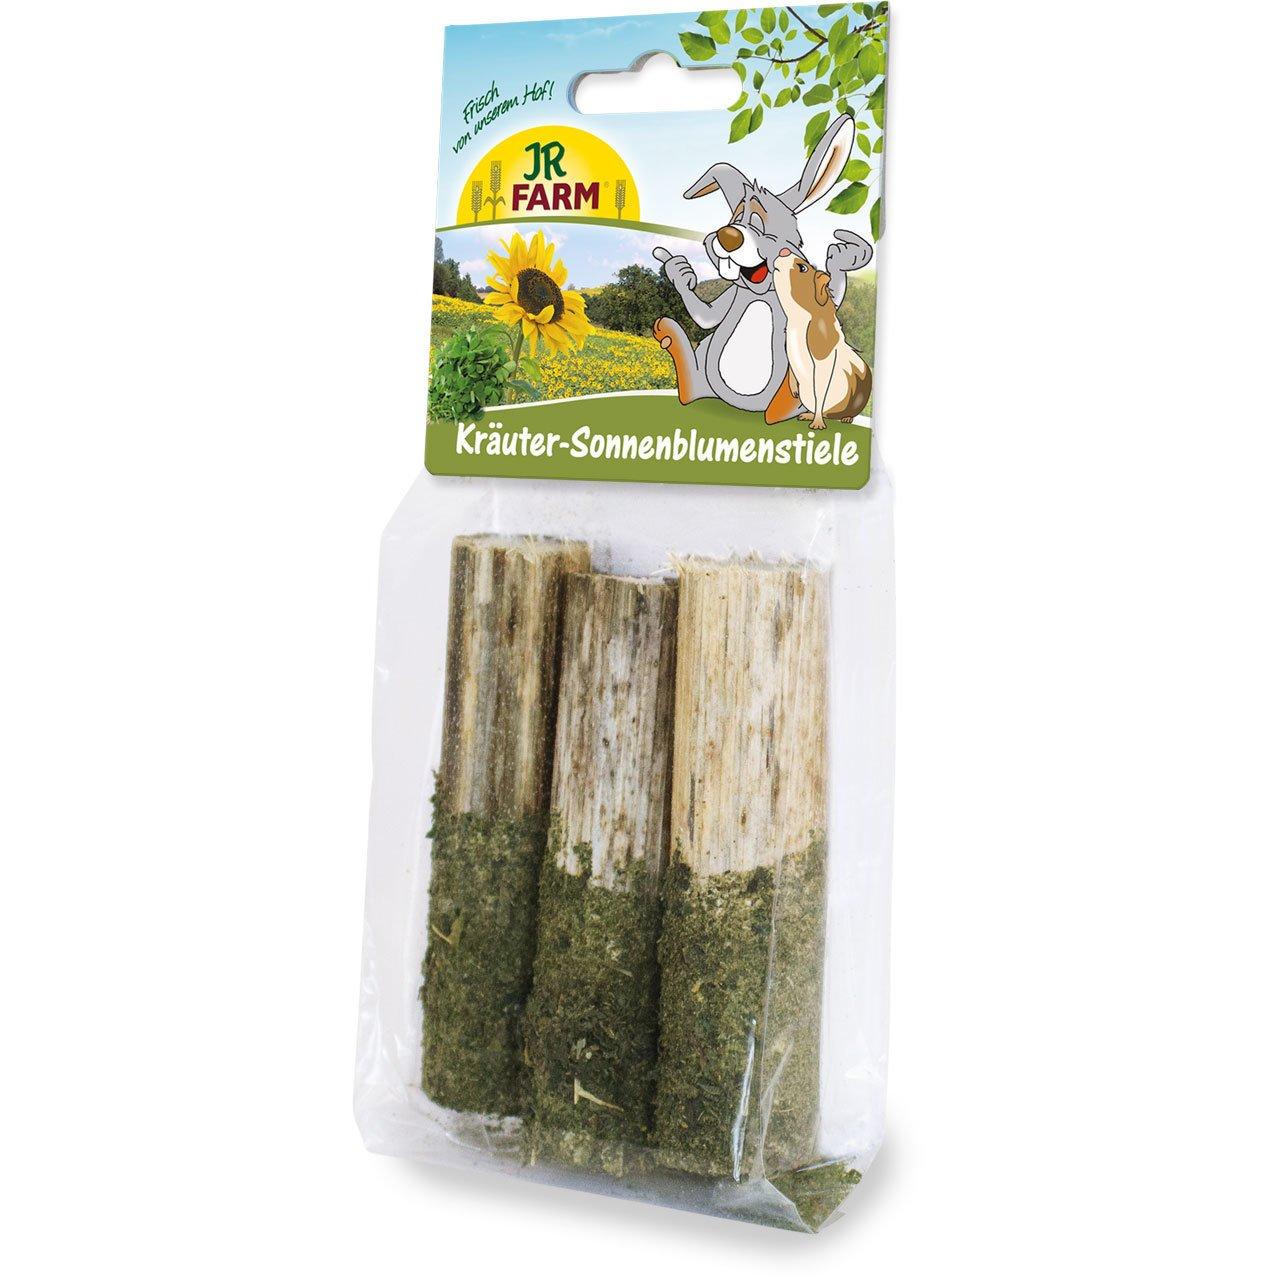 JR Farm Kräuter Sonnenblumenstiele, 20 g